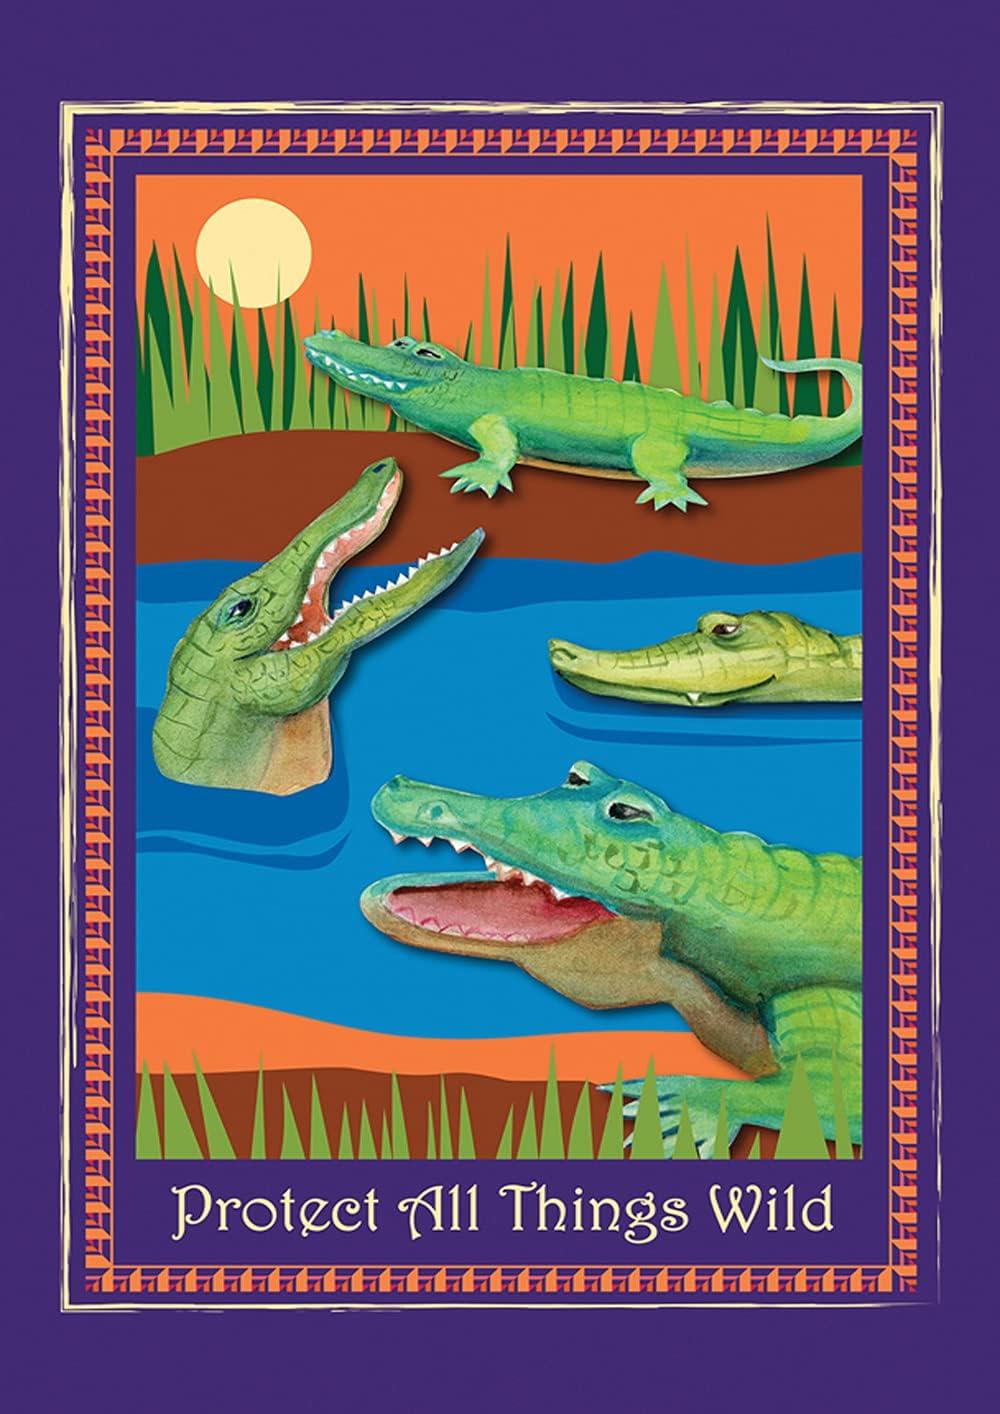 Toland Home Garden Protect Gators and Crocs 12.5 x 18-Inch Decorative USA-Produced Garden Flag